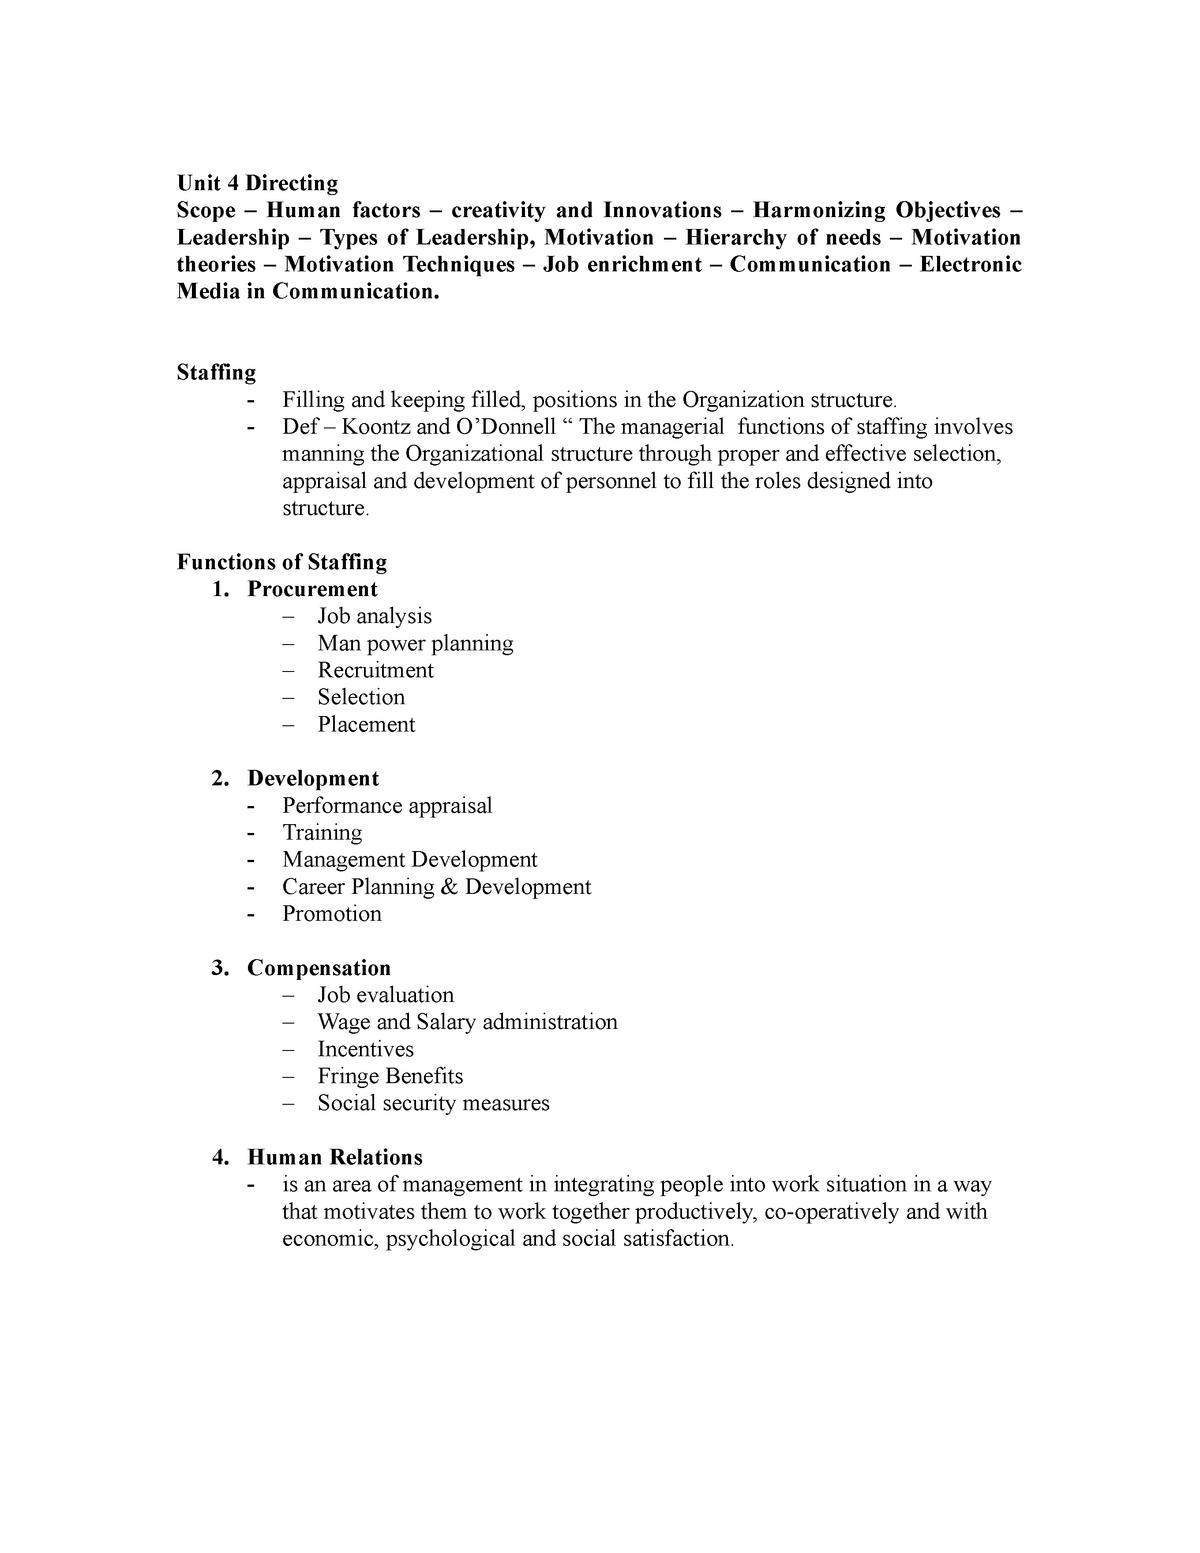 Unit 4 - leadership & directing - Management Principles